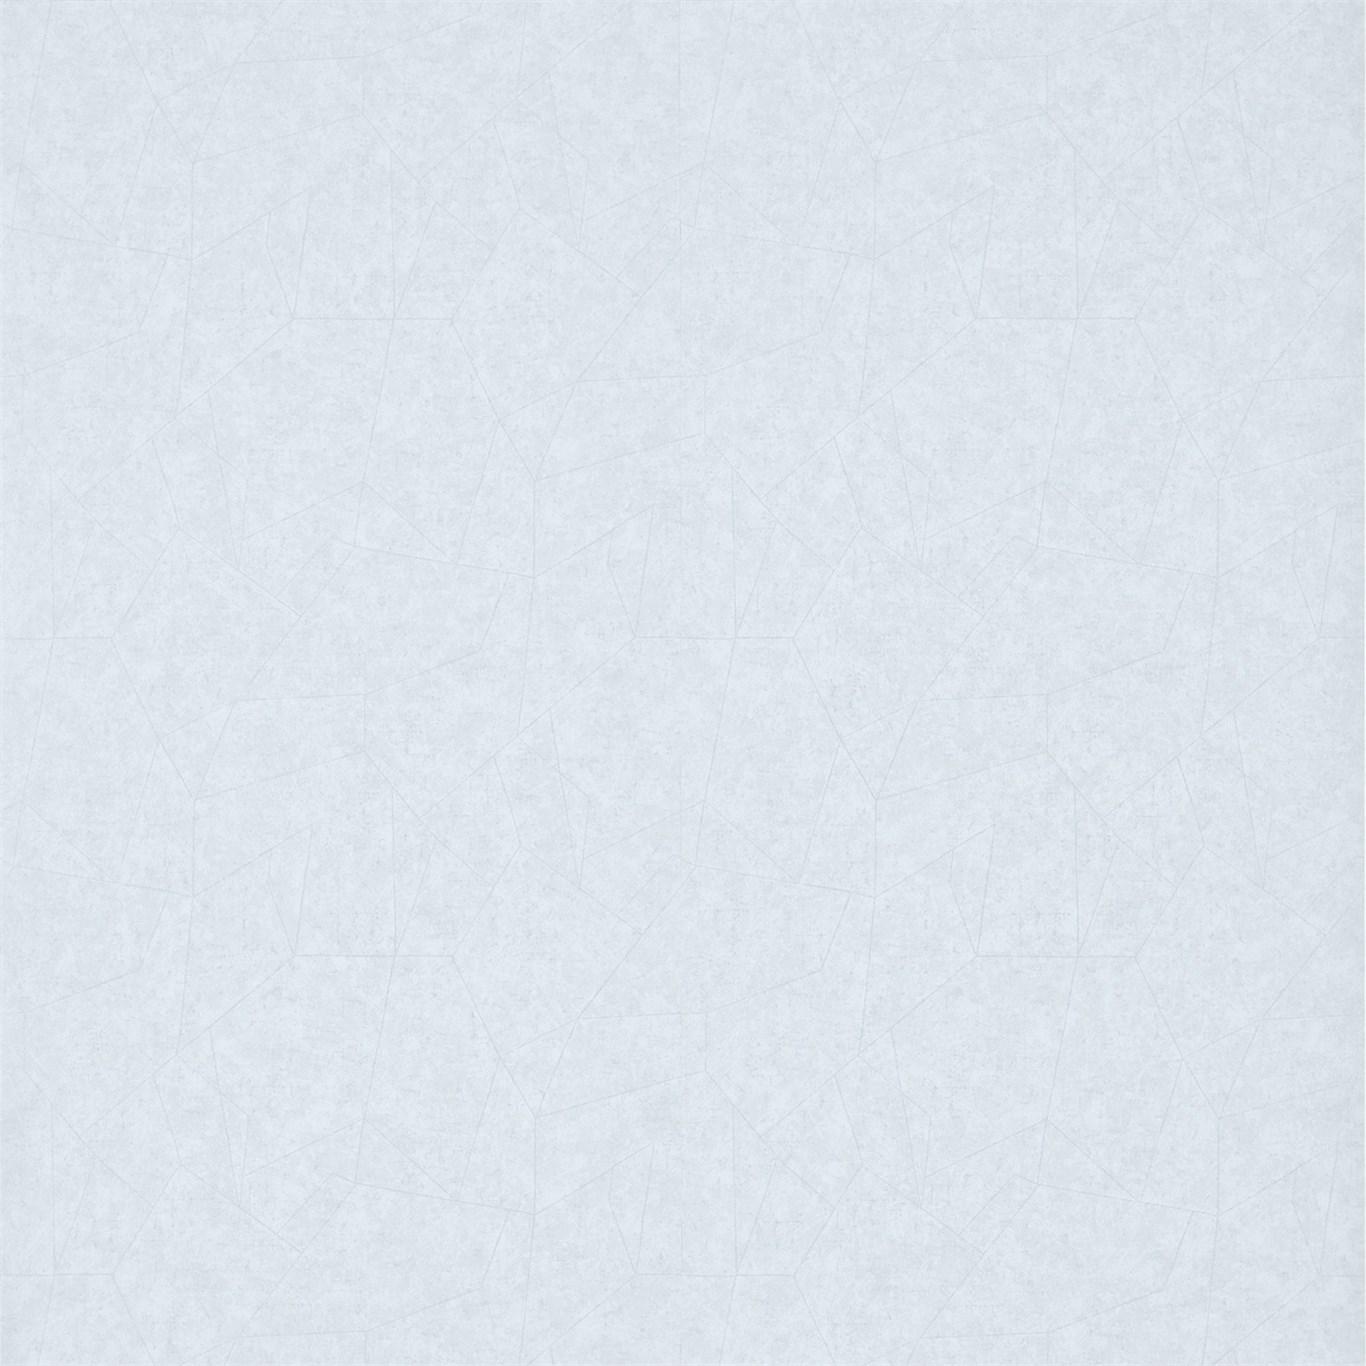 Английские обои Zoffany,  коллекция Prism Vinyls, артикул311794